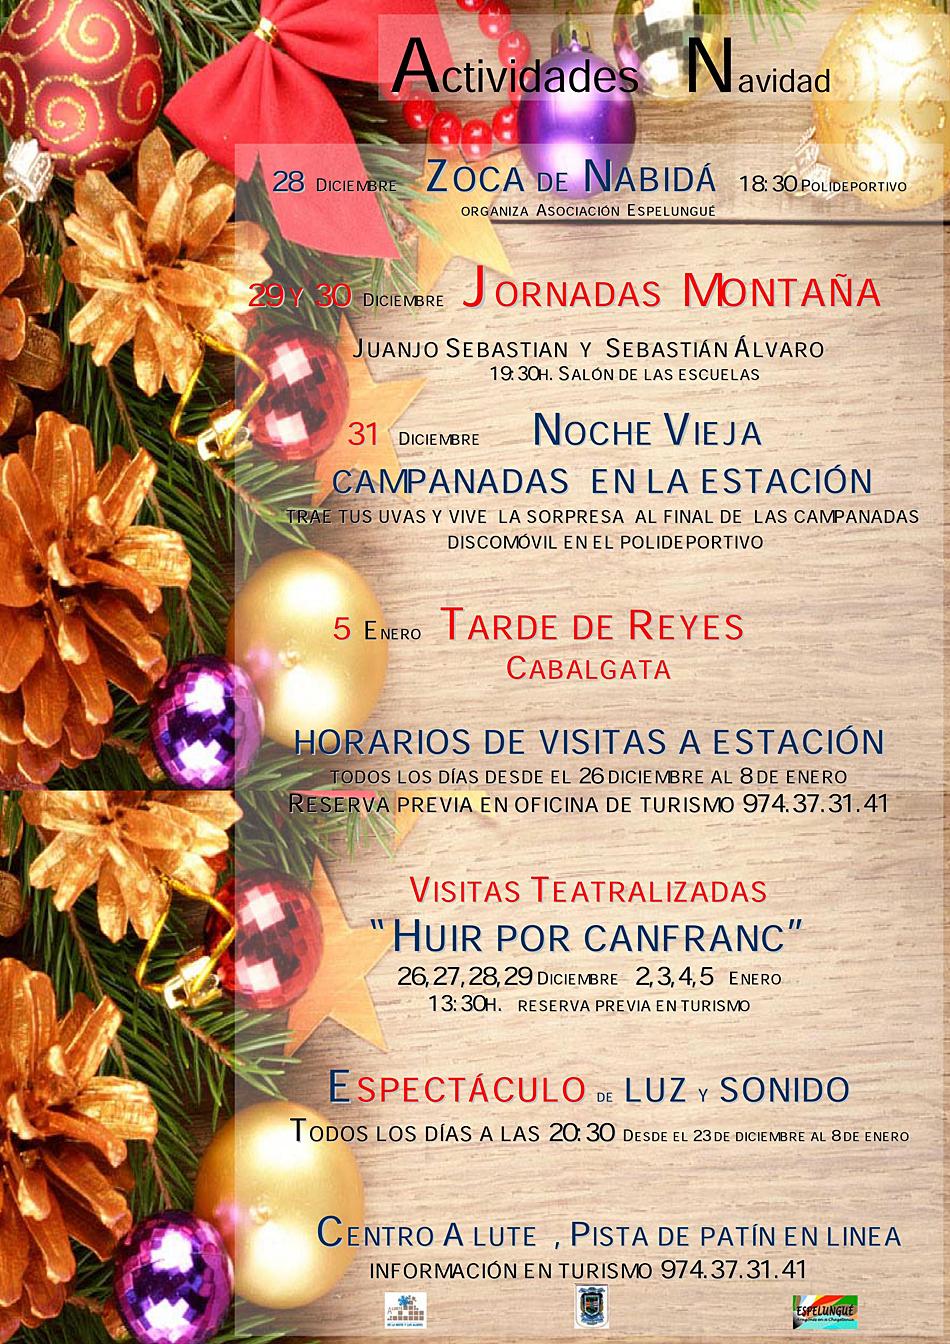 Actividades en Canfranc- Navidad 2016